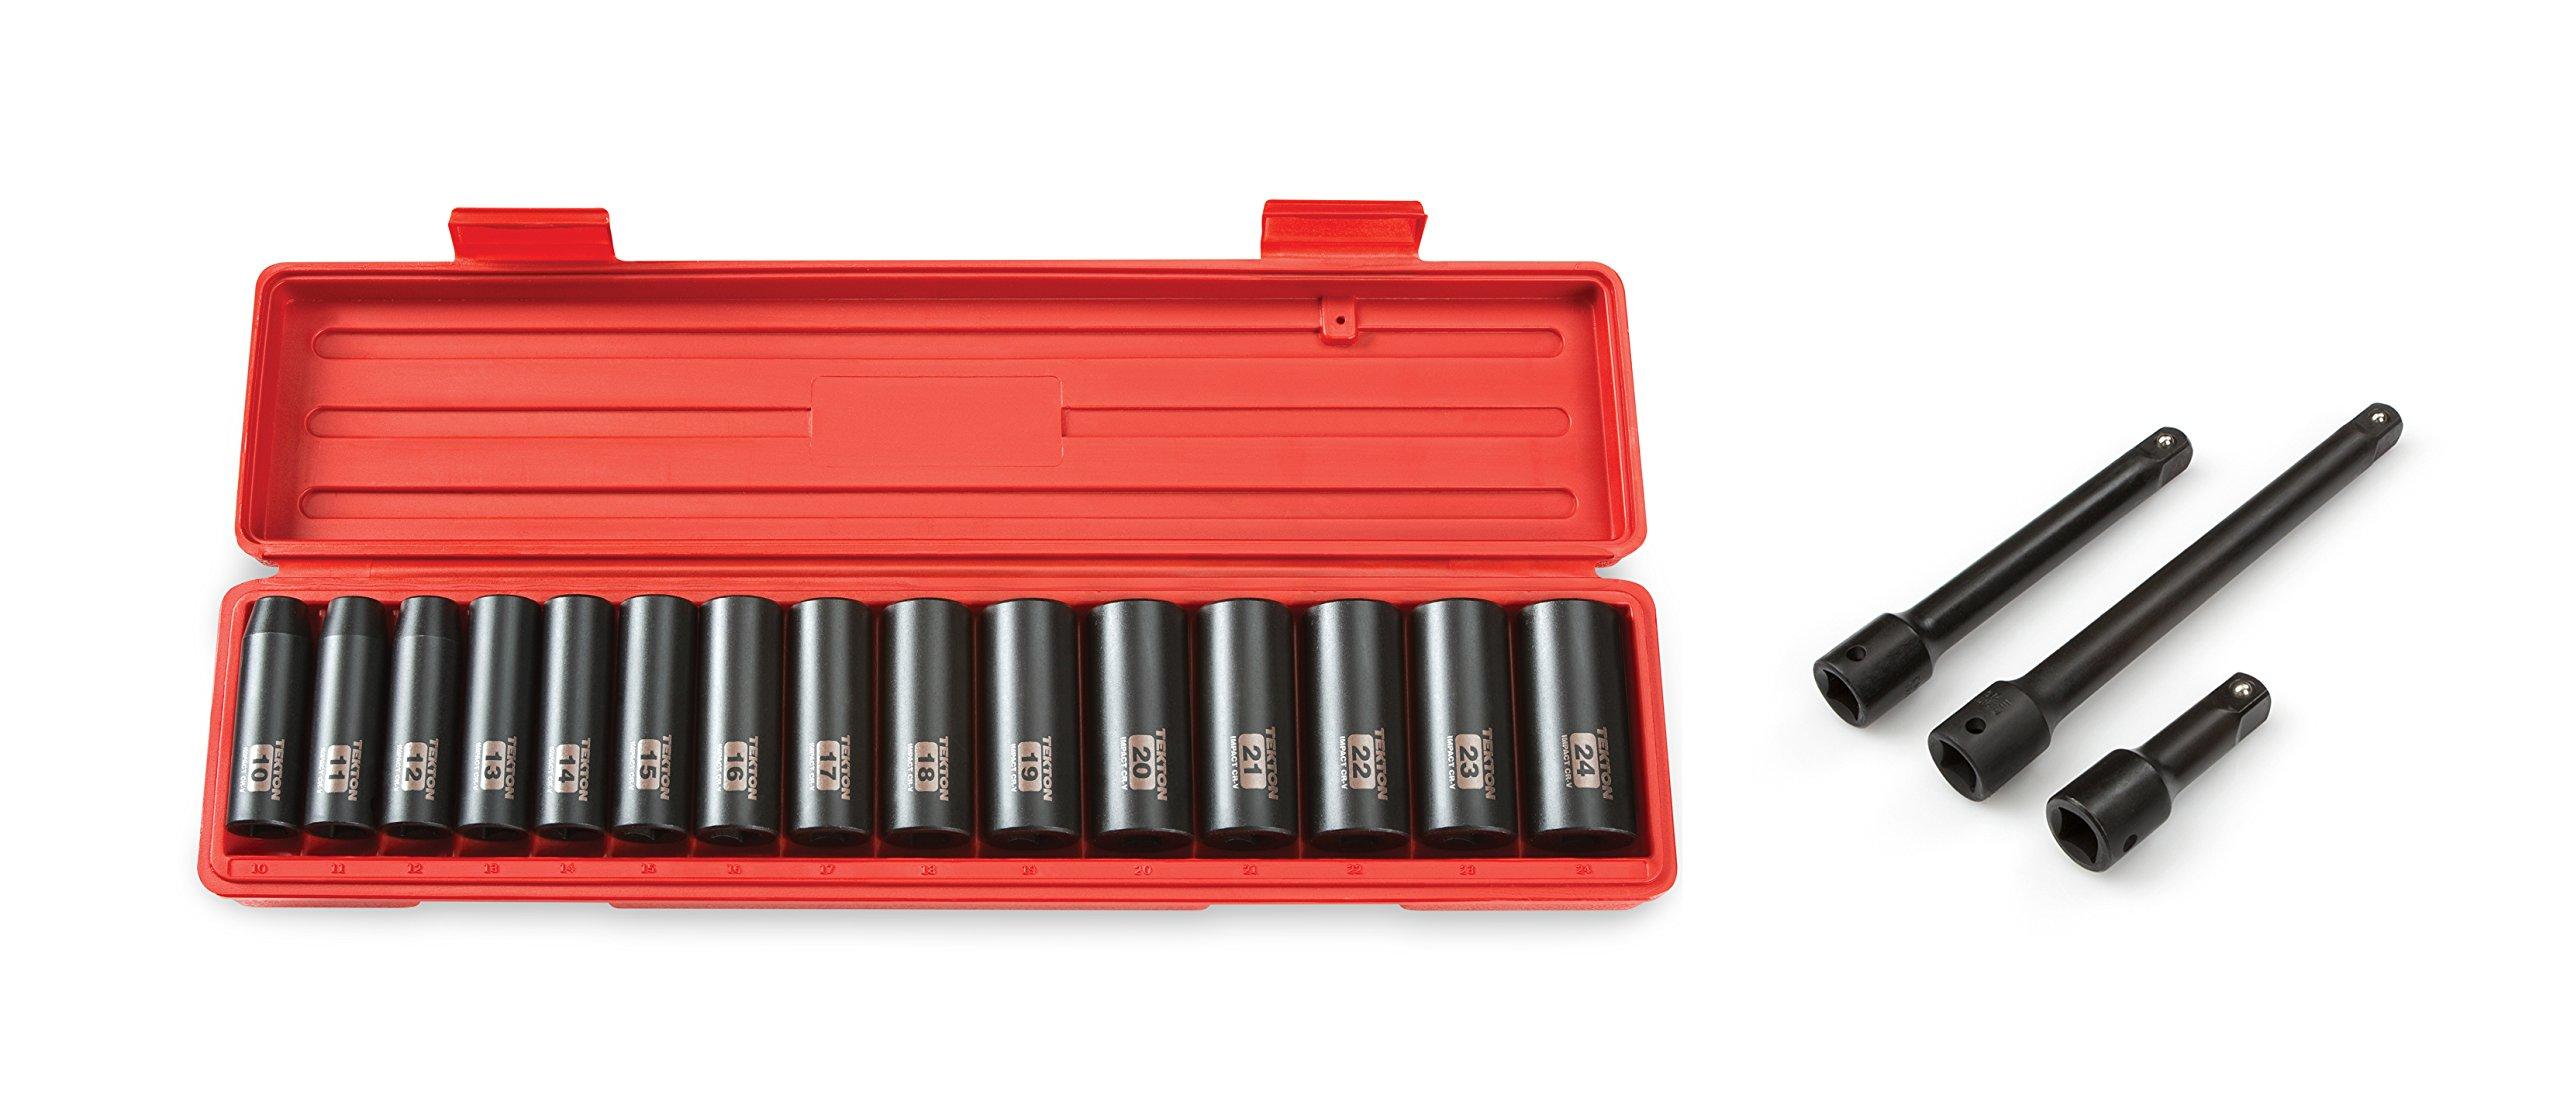 TEKTON 4883 1/2-Inch Drive Deep Impact Socket Set, Metric, 10 mm - 24 mm, 15-Sockets with TEKTON 4971 1/2-Inch Drive Impact Extension Bar Set